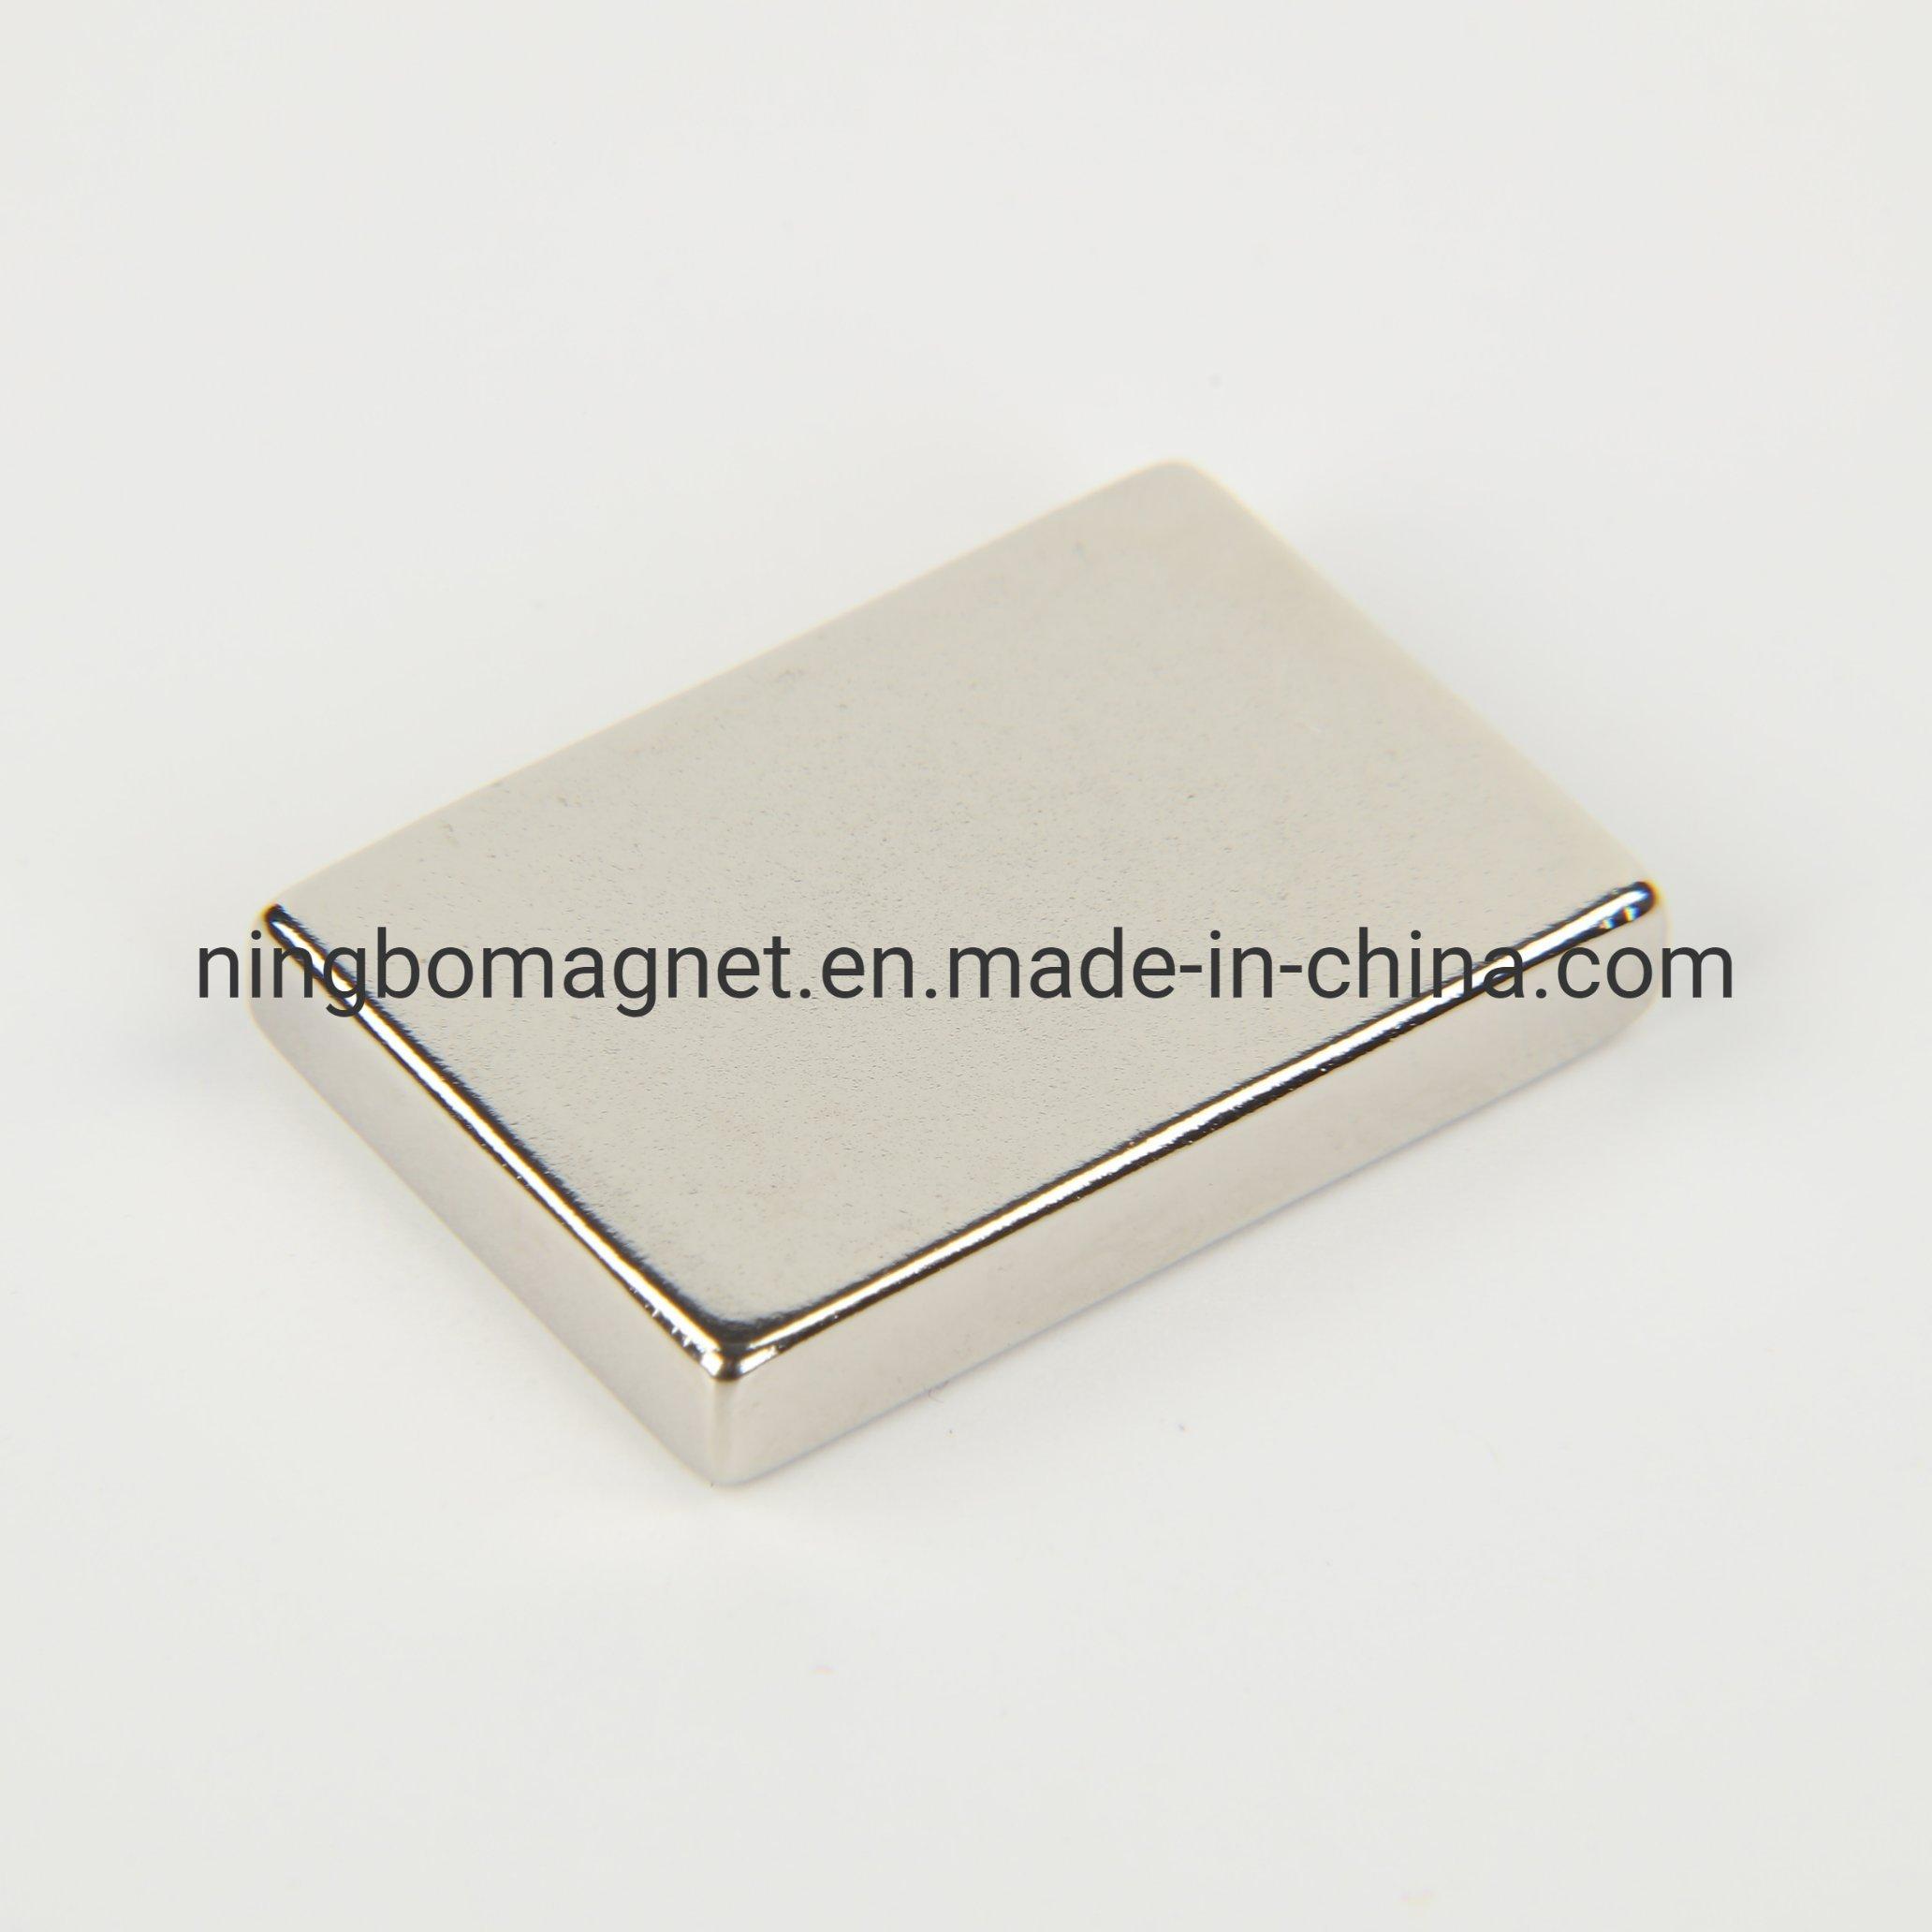 Ningbo Magnet Co., Ltd.